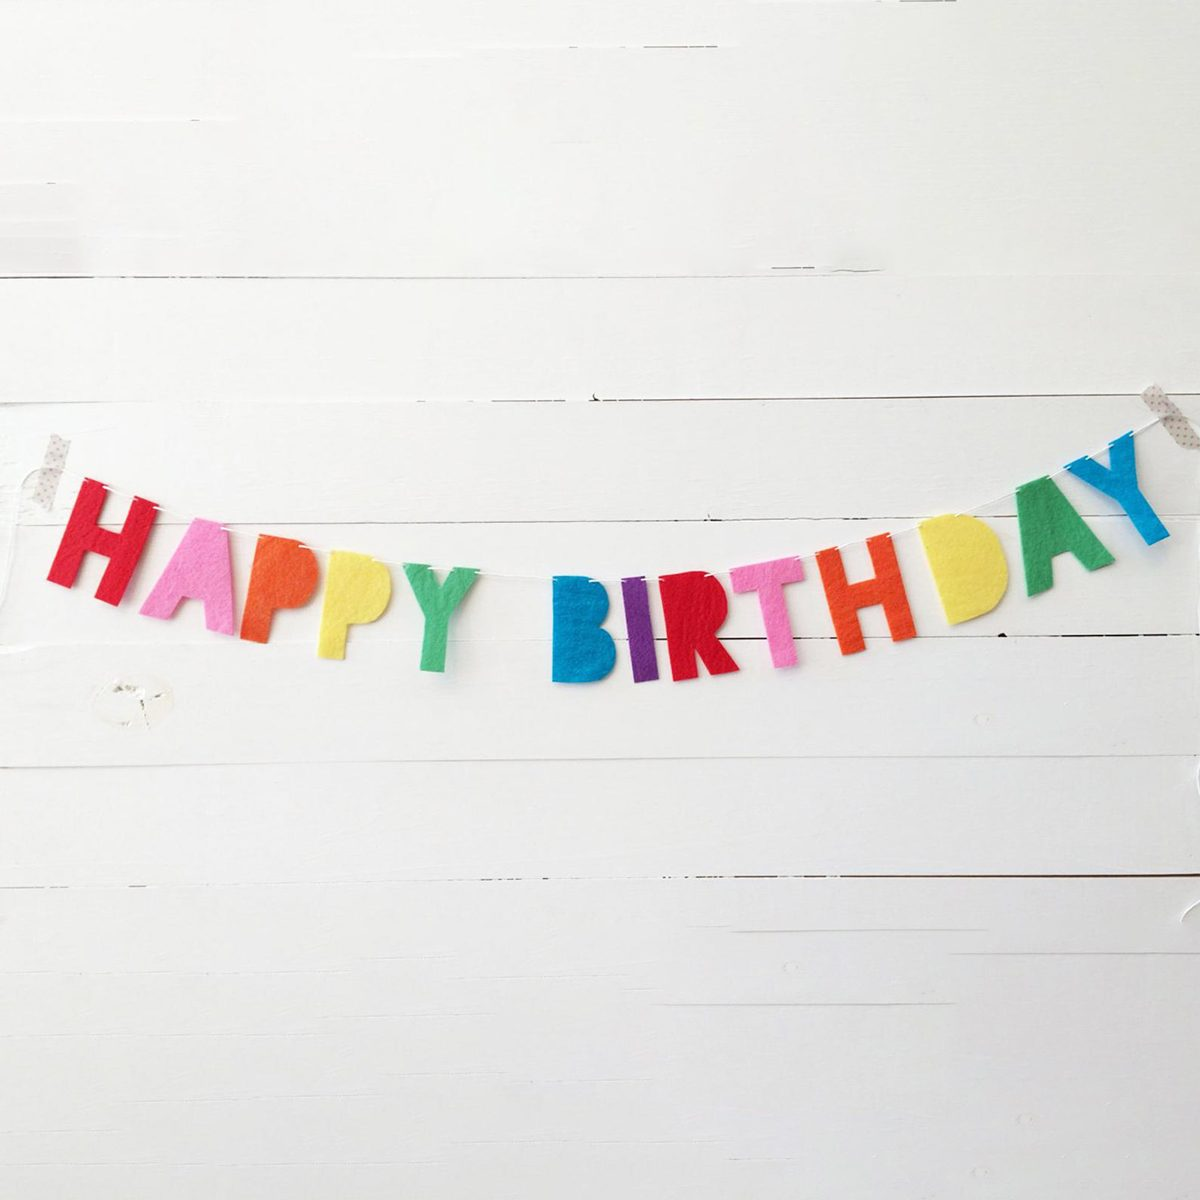 Happy Birthday rainbow felt banner {stiffened felt}